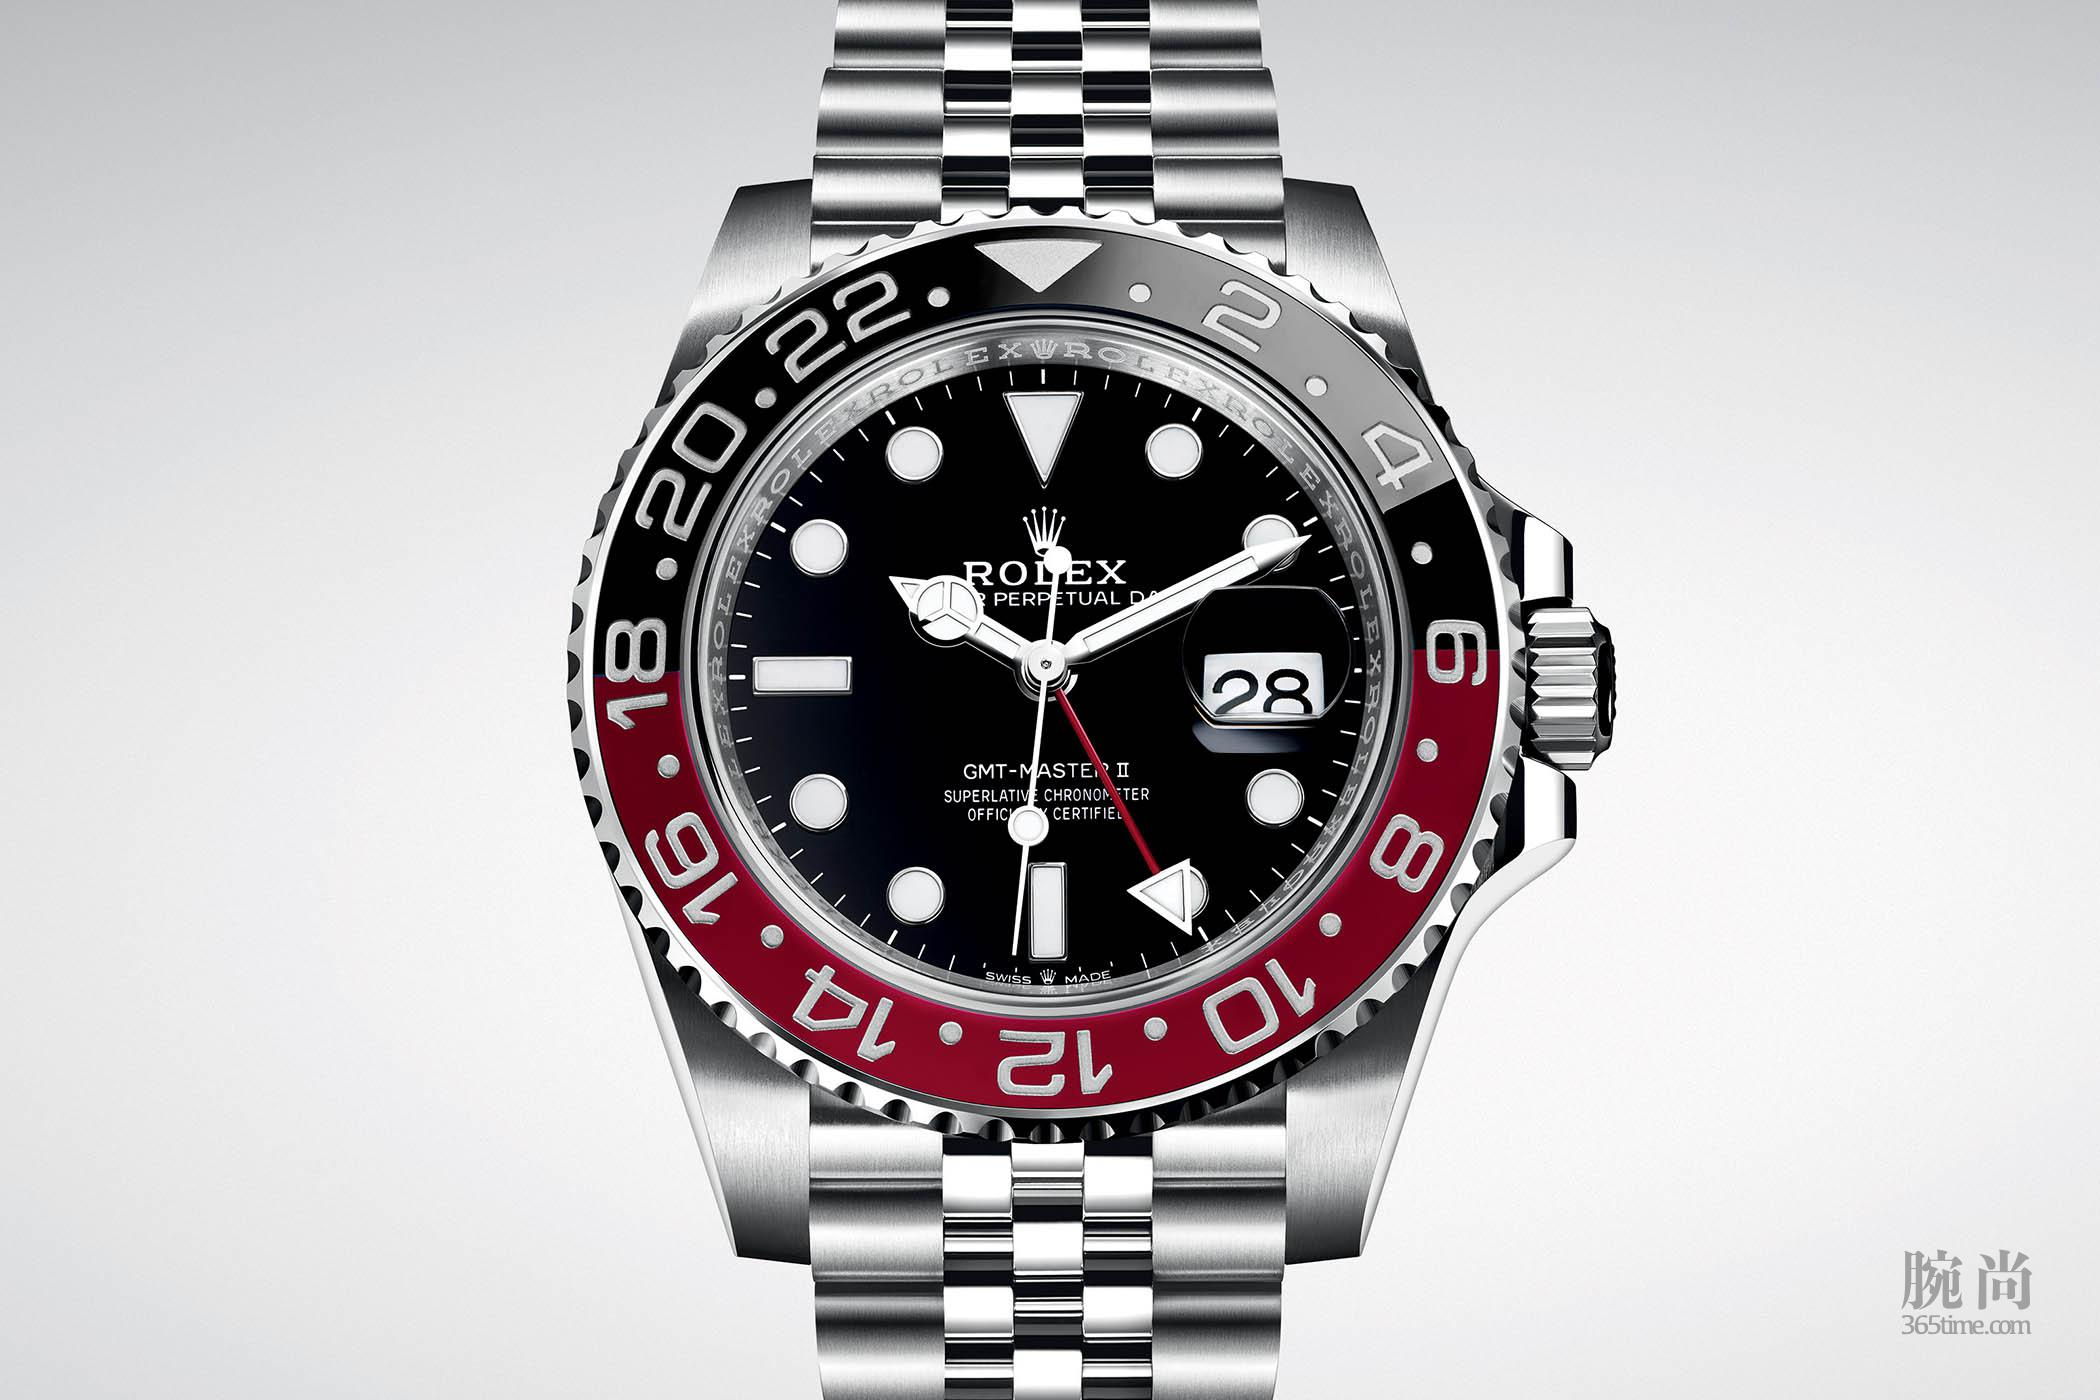 Rolex-GMT-Master-II-Coke-Black-red-Bezel-Jubilee-Calibre-3285-ref-126710RONR-Rolex-Baselworld-2019-Rolex-2019-Predictions-1.jpg